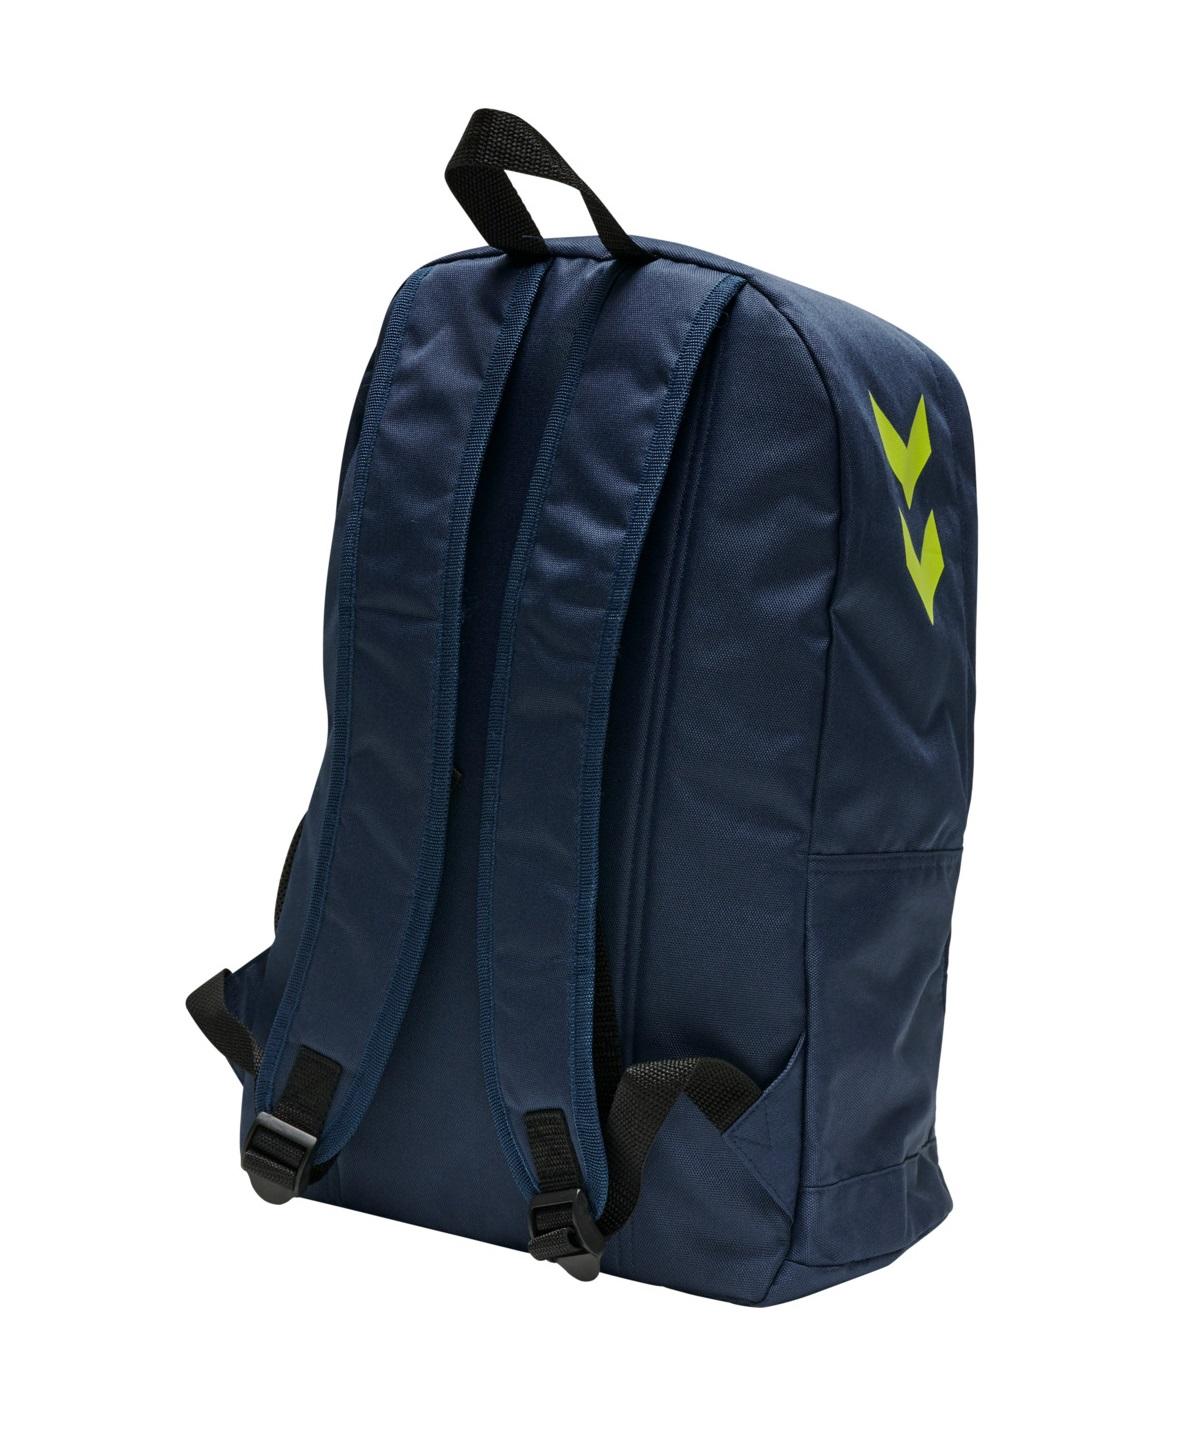 hummel Core Backpack Dark Denim / Lime Punch